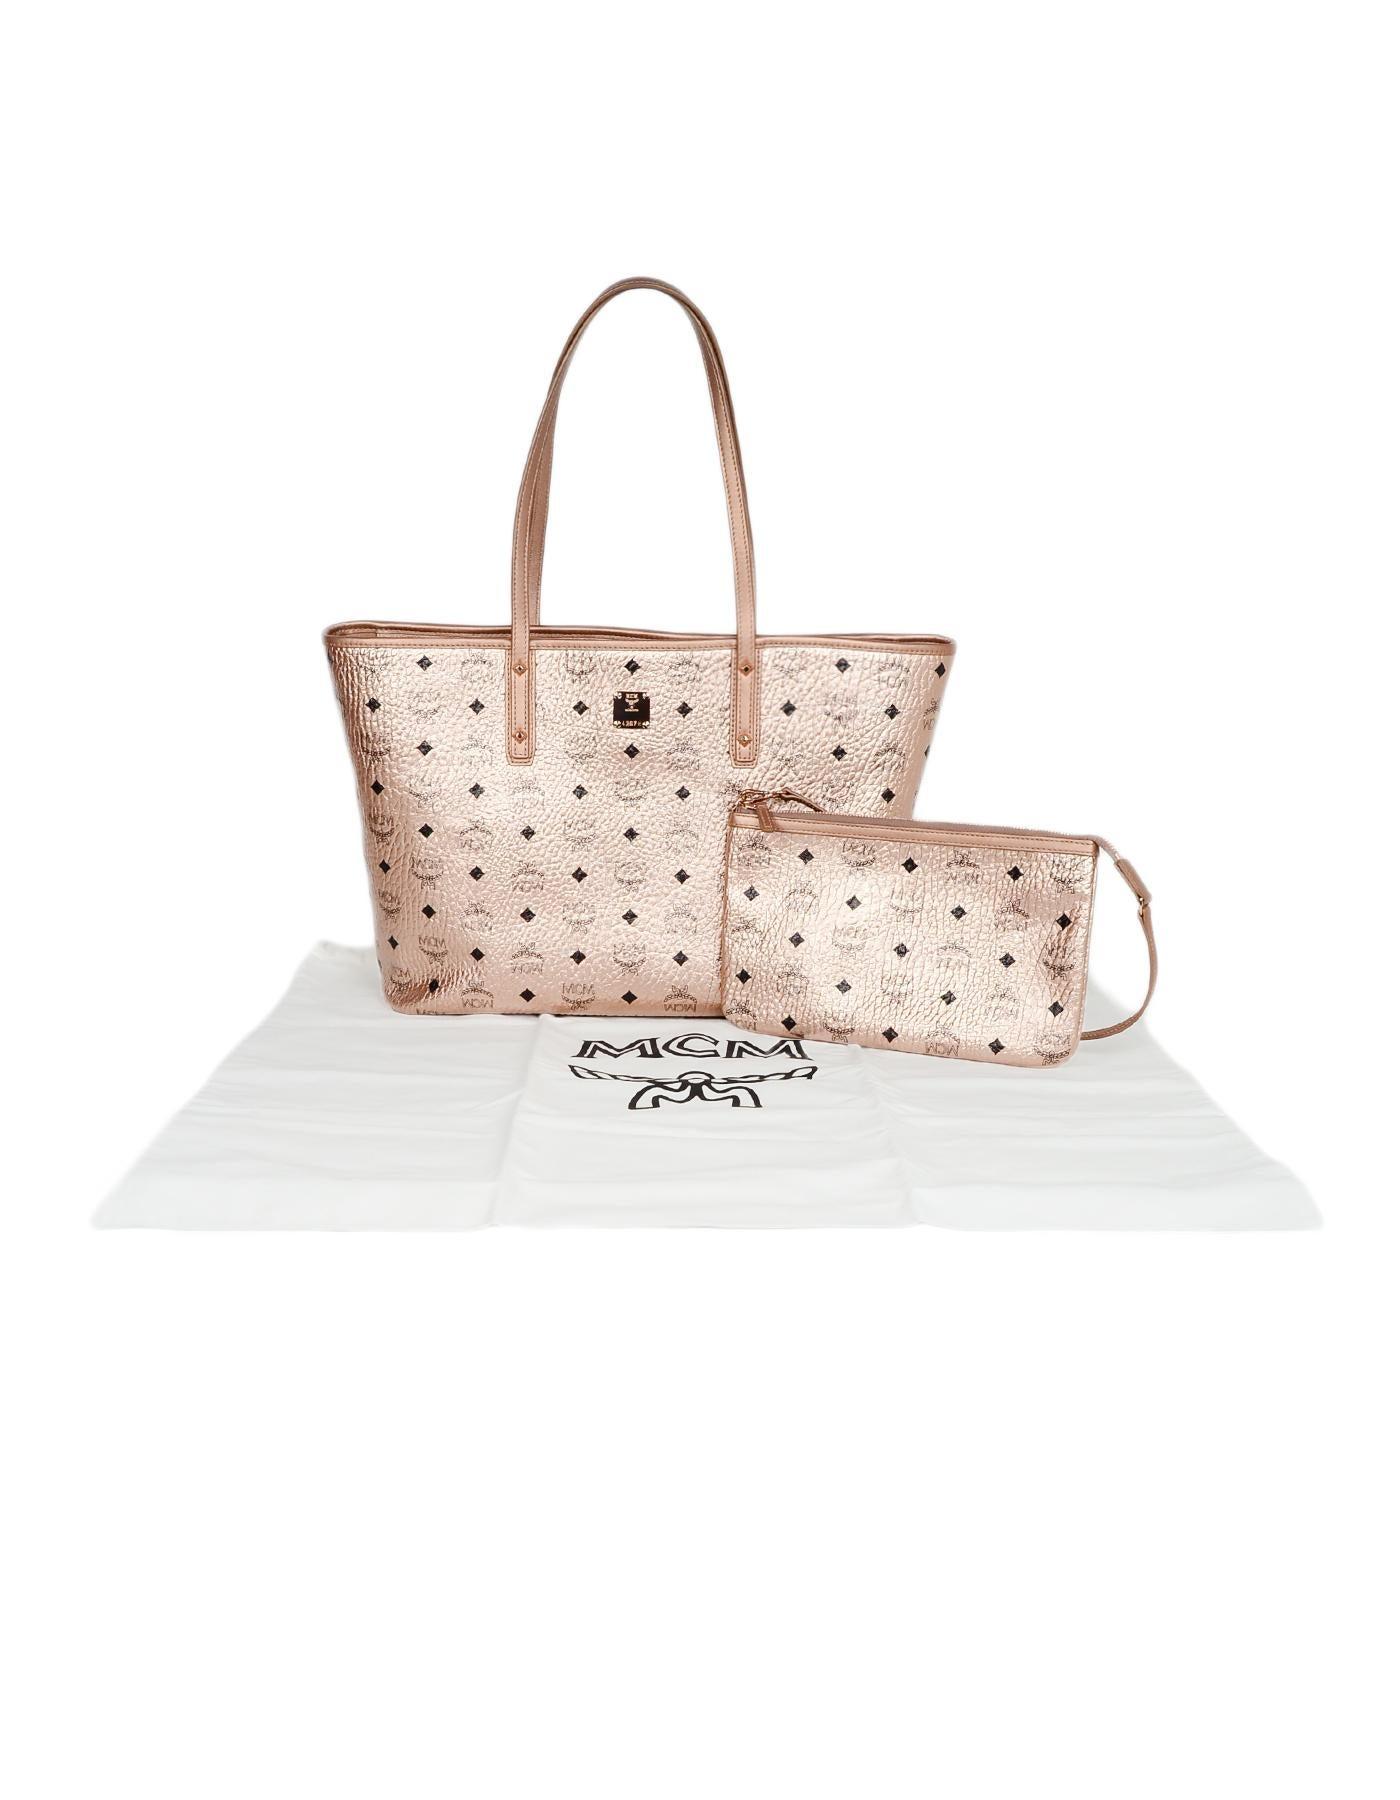 7d0fae2a62 MCM Metallic Pink Monogram Visetos Medium Anya Zip Top Shopper Tote Bag For  Sale at 1stdibs